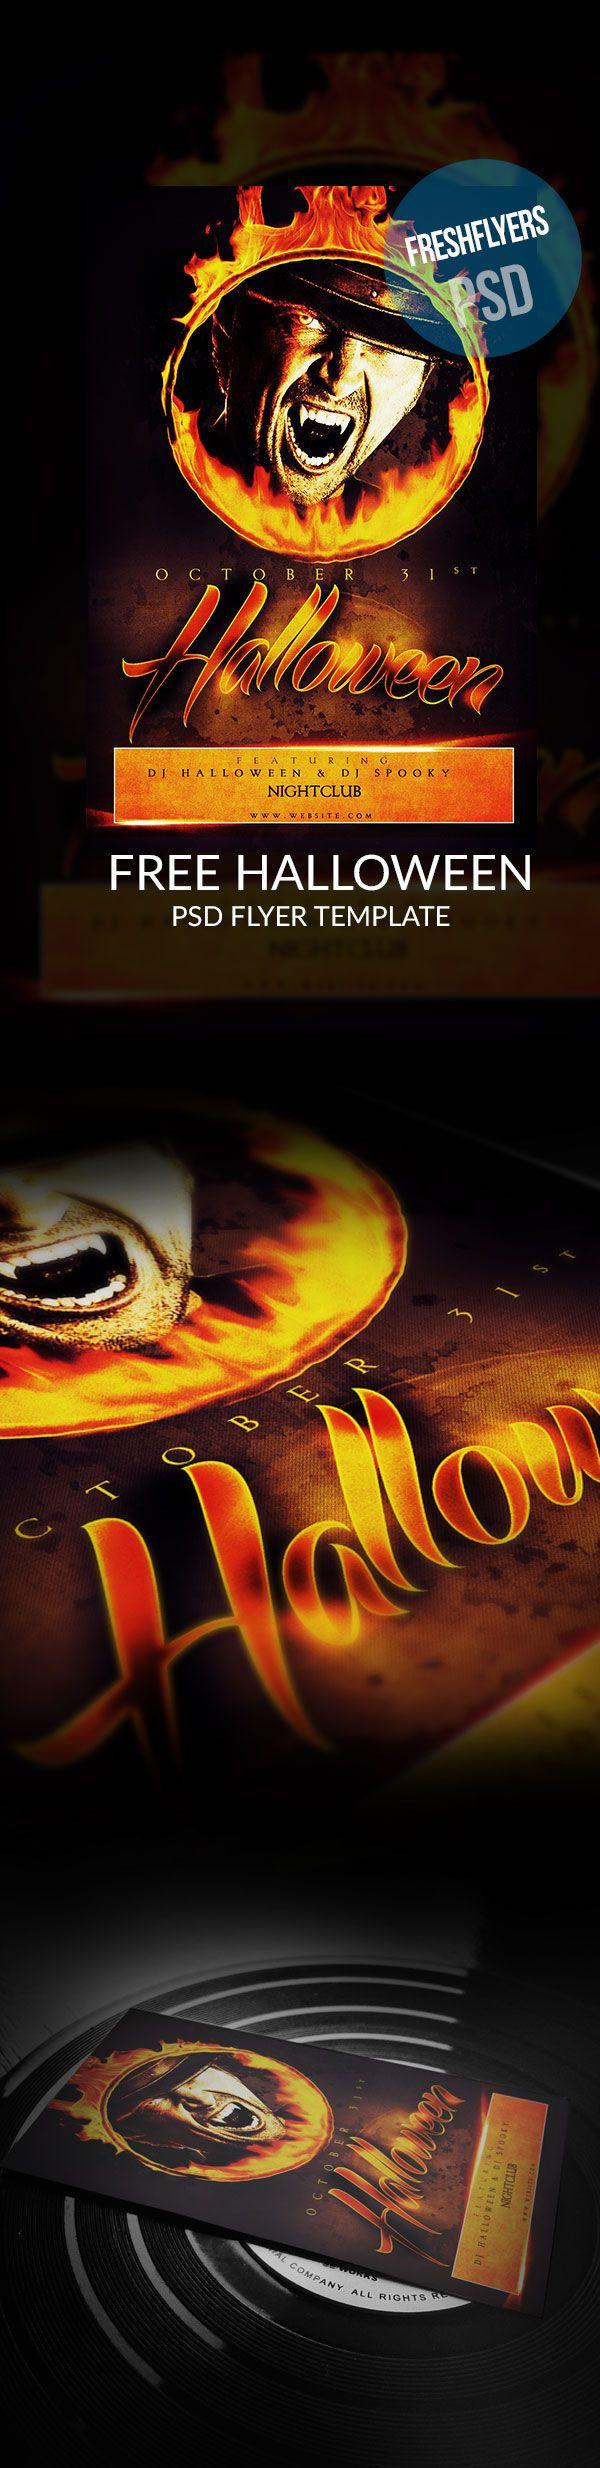 16 Best Free Halloween Flyer Templates